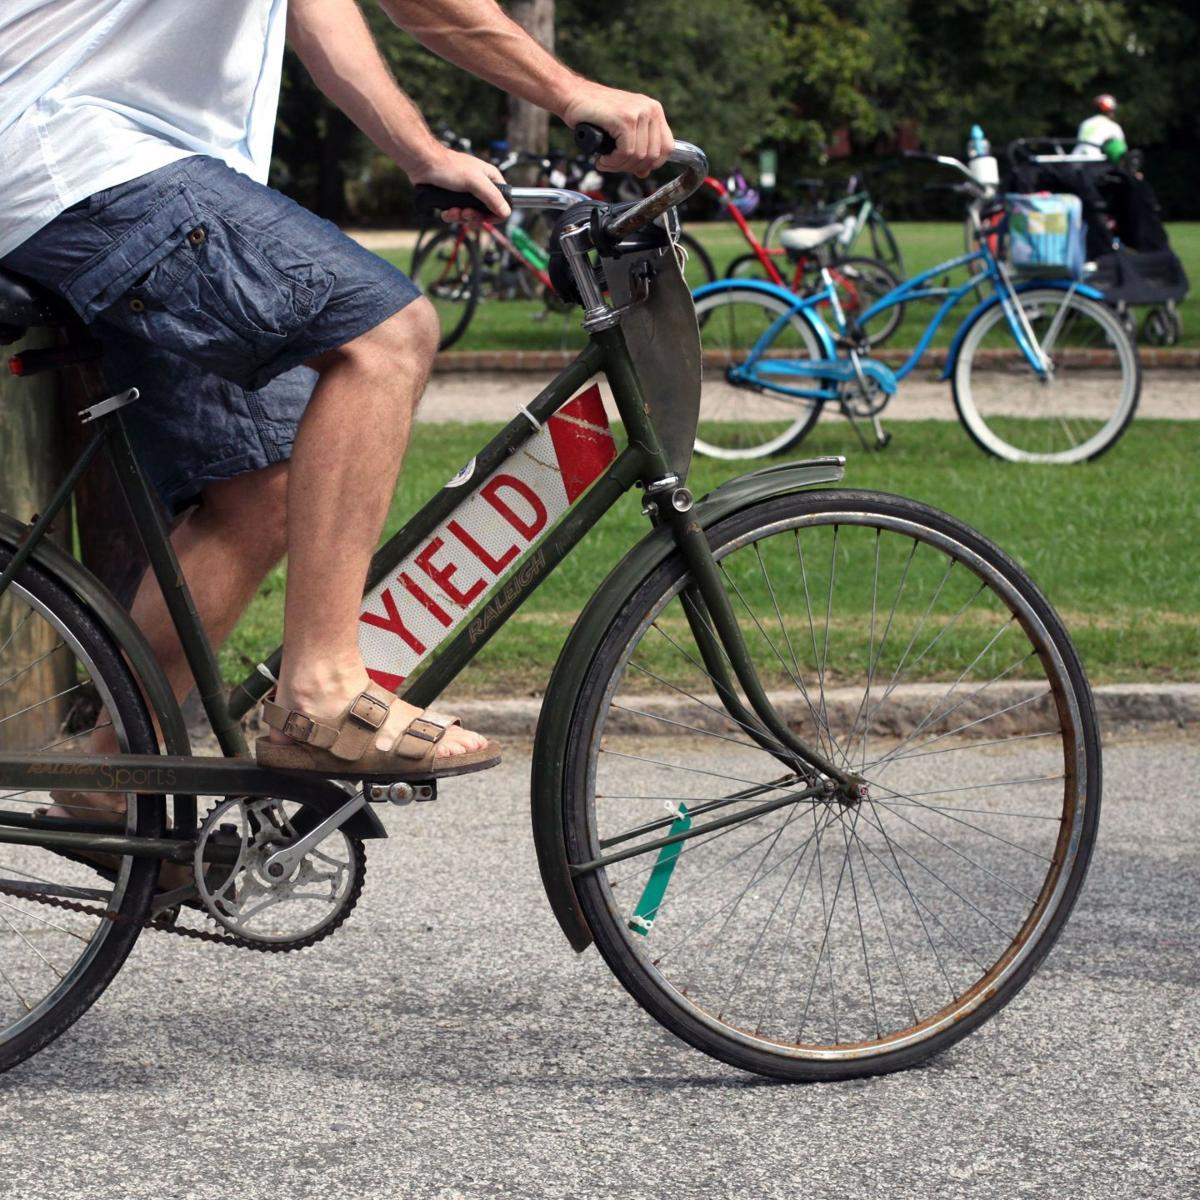 Bike Month is a wheel challenge